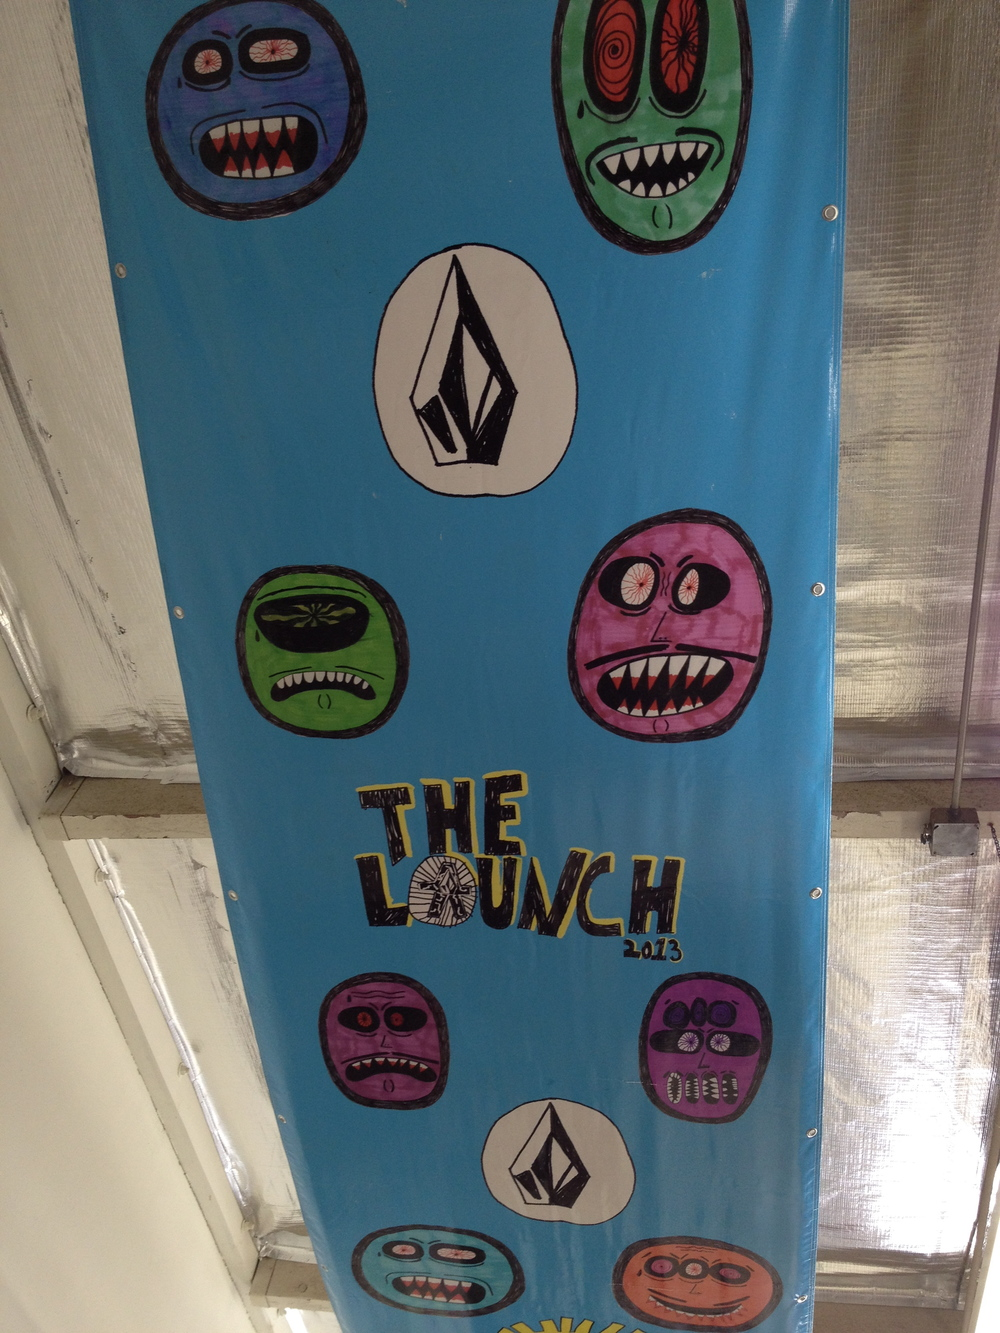 Inside Kid Creature's studio: Bear Mountain'sVolcom-sponsored The Launch 2013 banner (Photo by Lauren Lloyd)